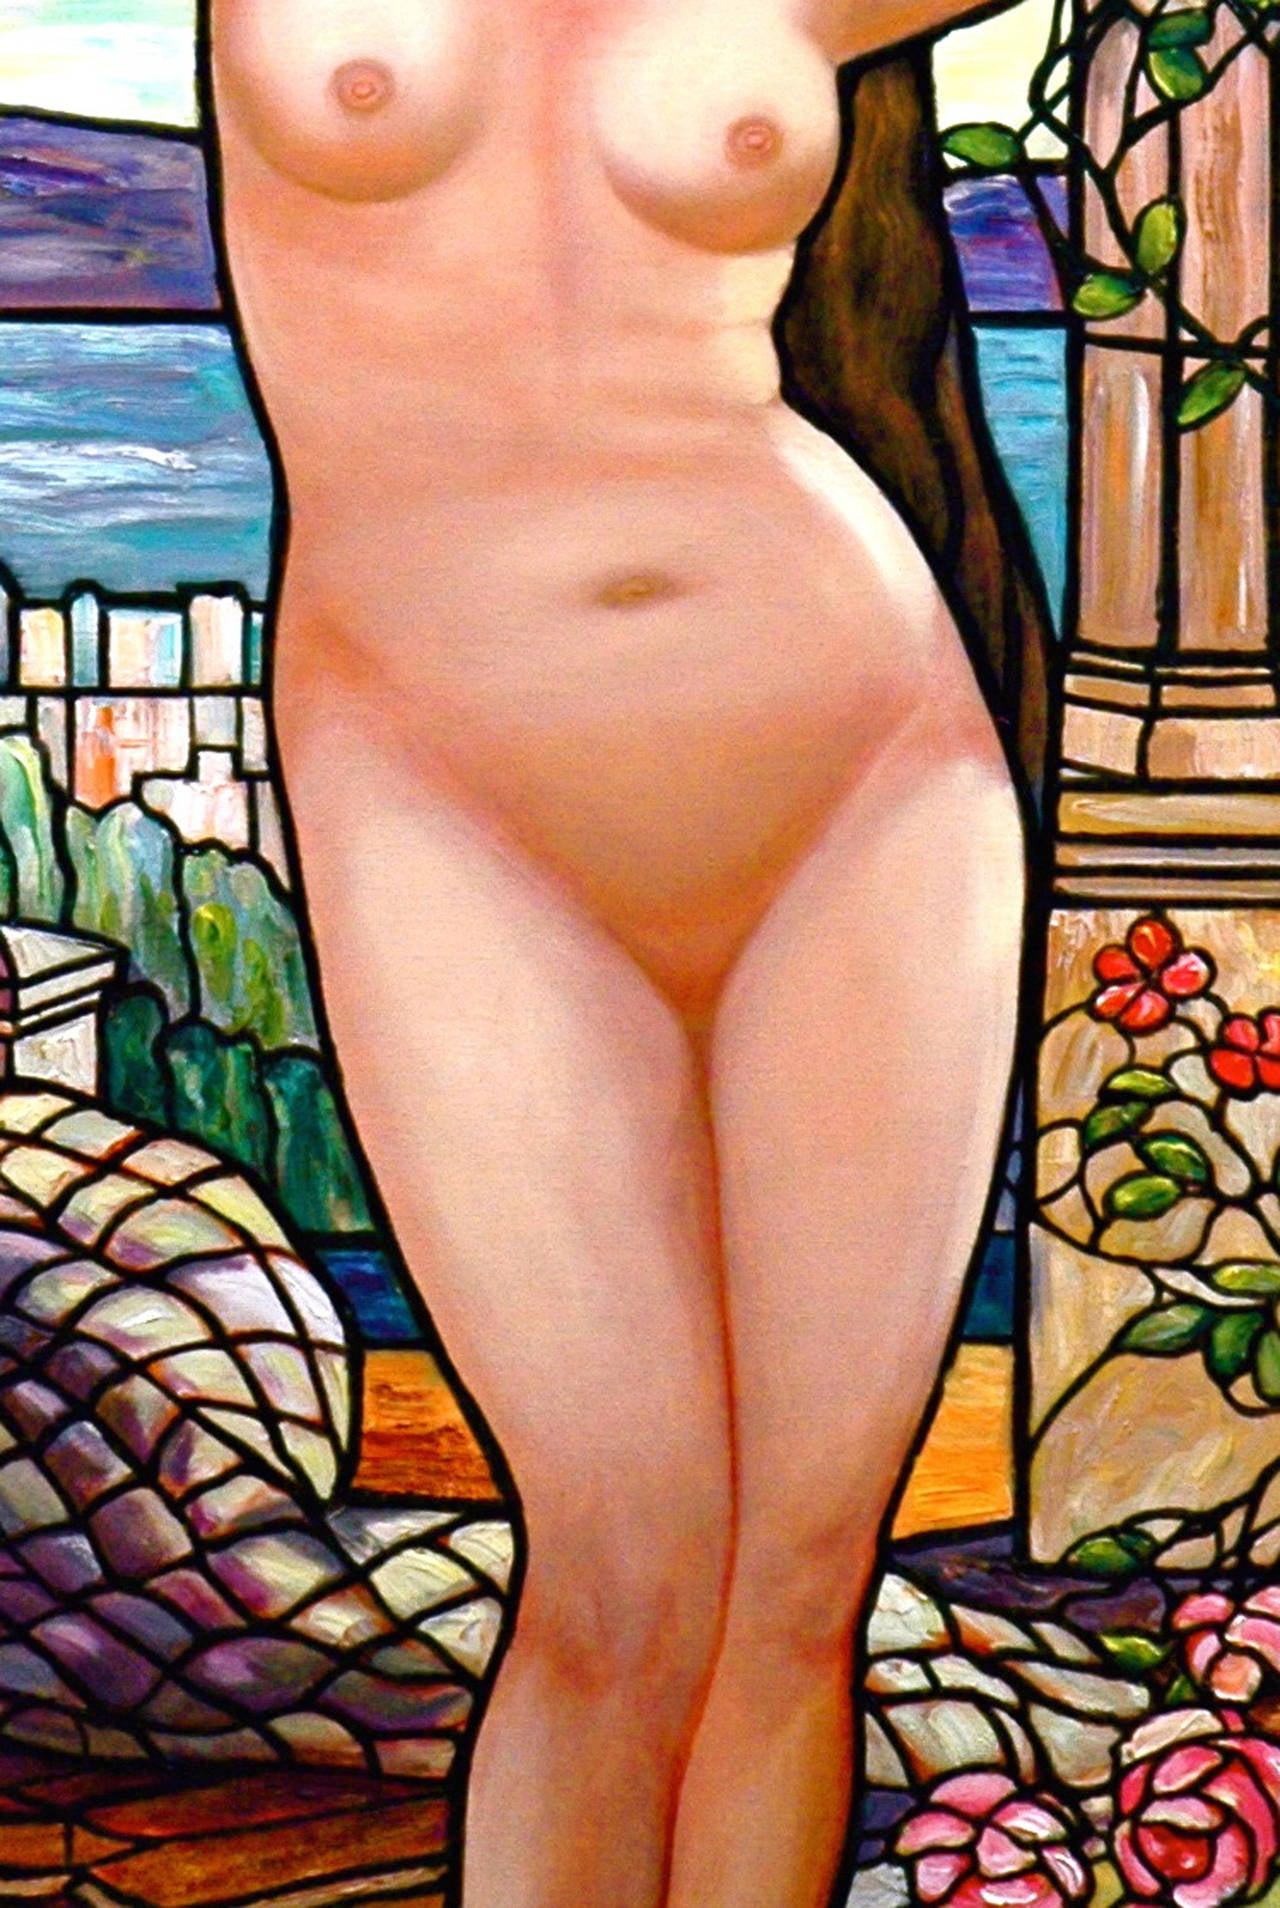 Tiffany Style Nude with Wisterias - Painting by Kristina Nemethy